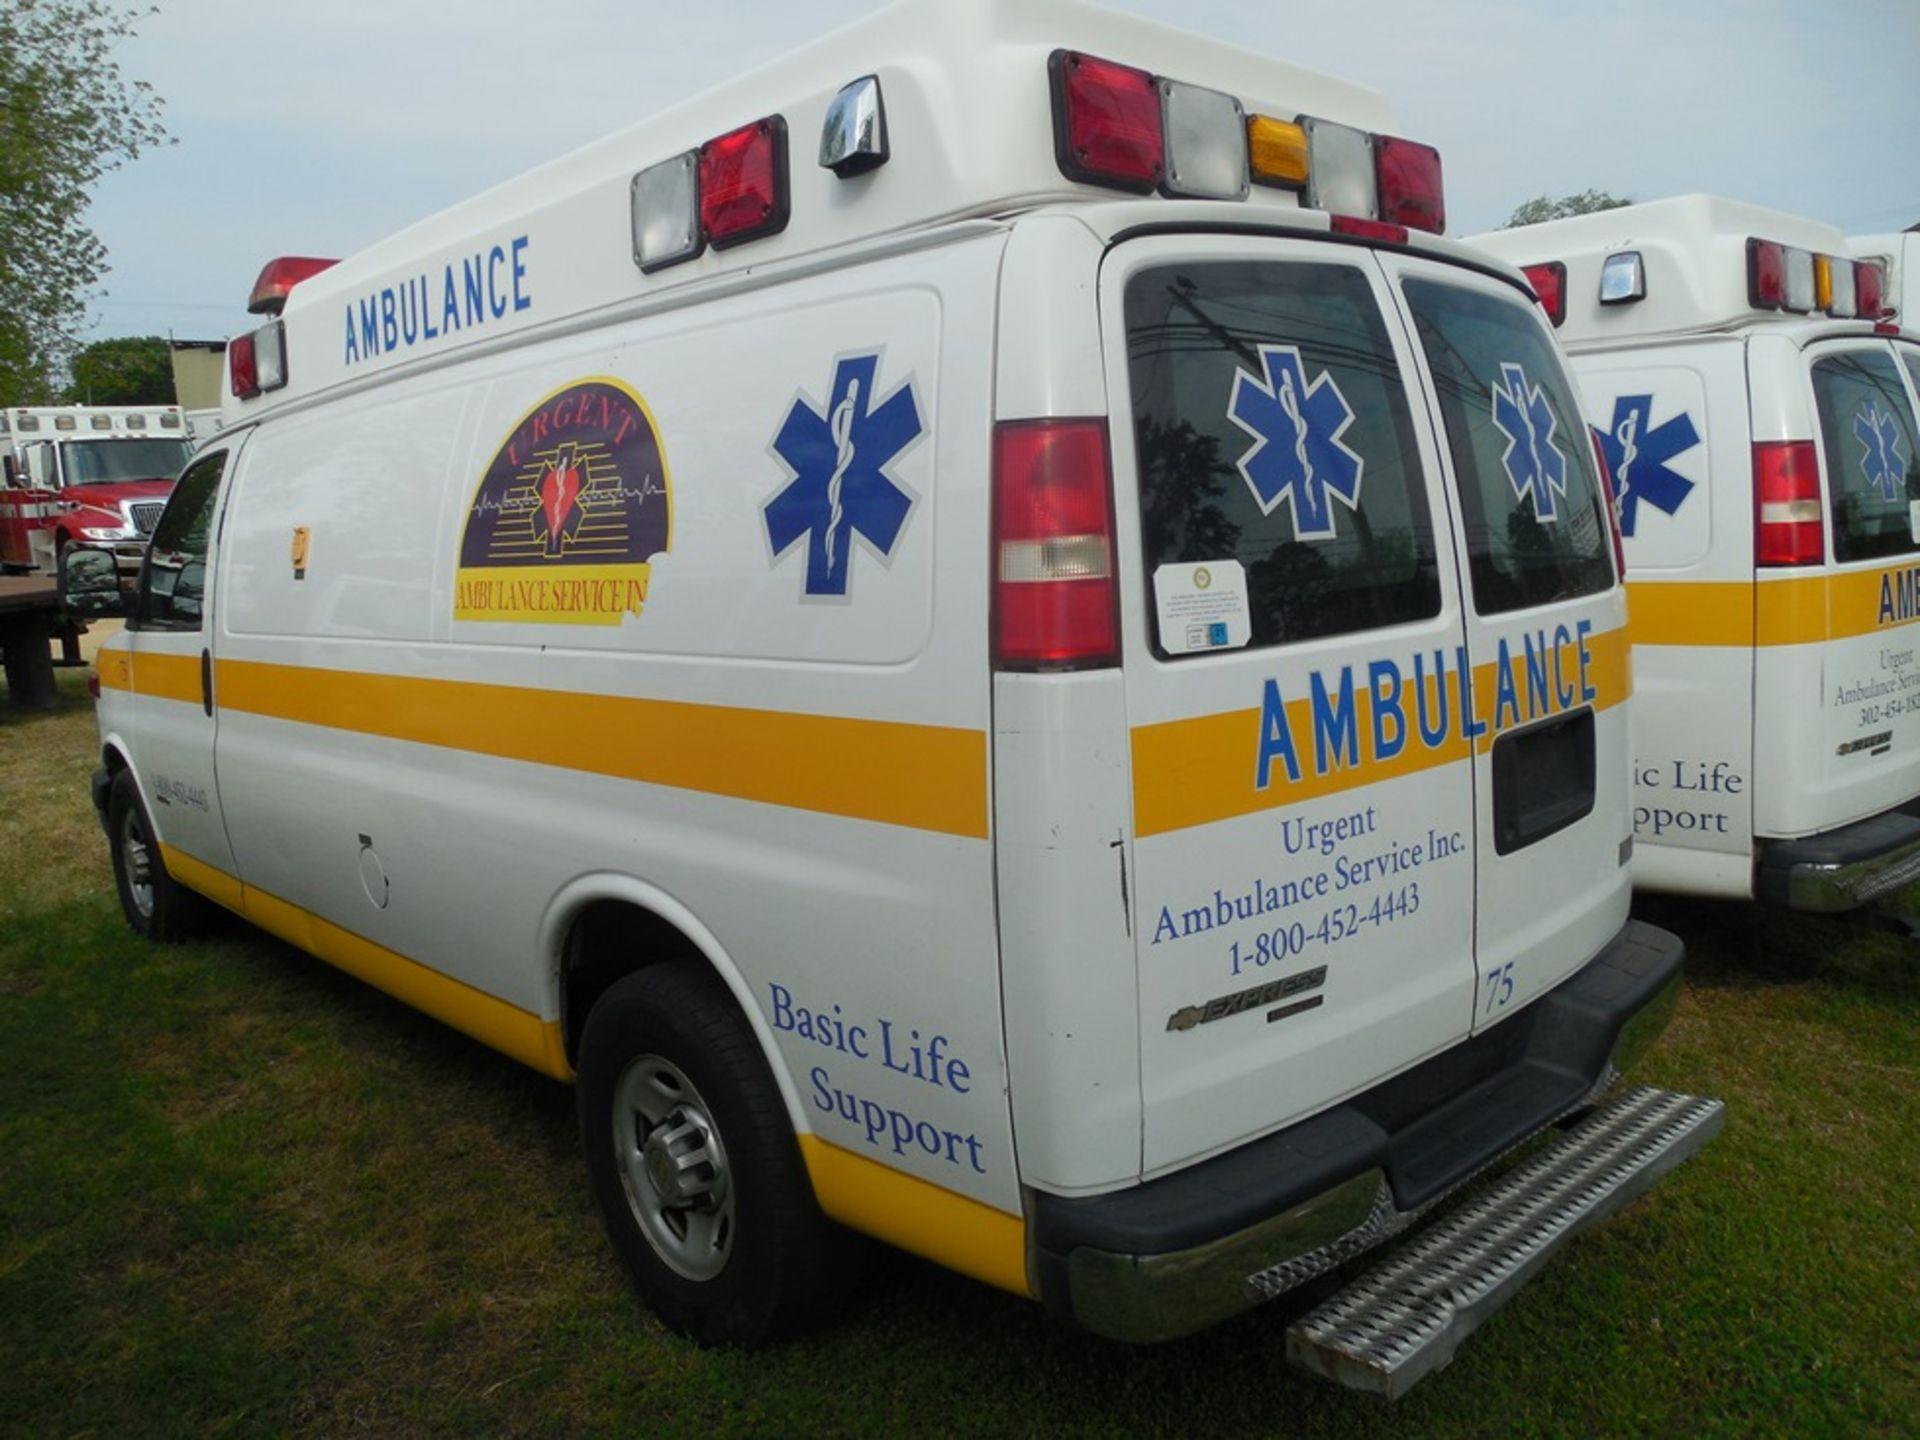 2013 Chev van ambulance dsl, Express Stable Trac 204,709 miles vin# 1GBZGUC13D1130018 - Image 5 of 6